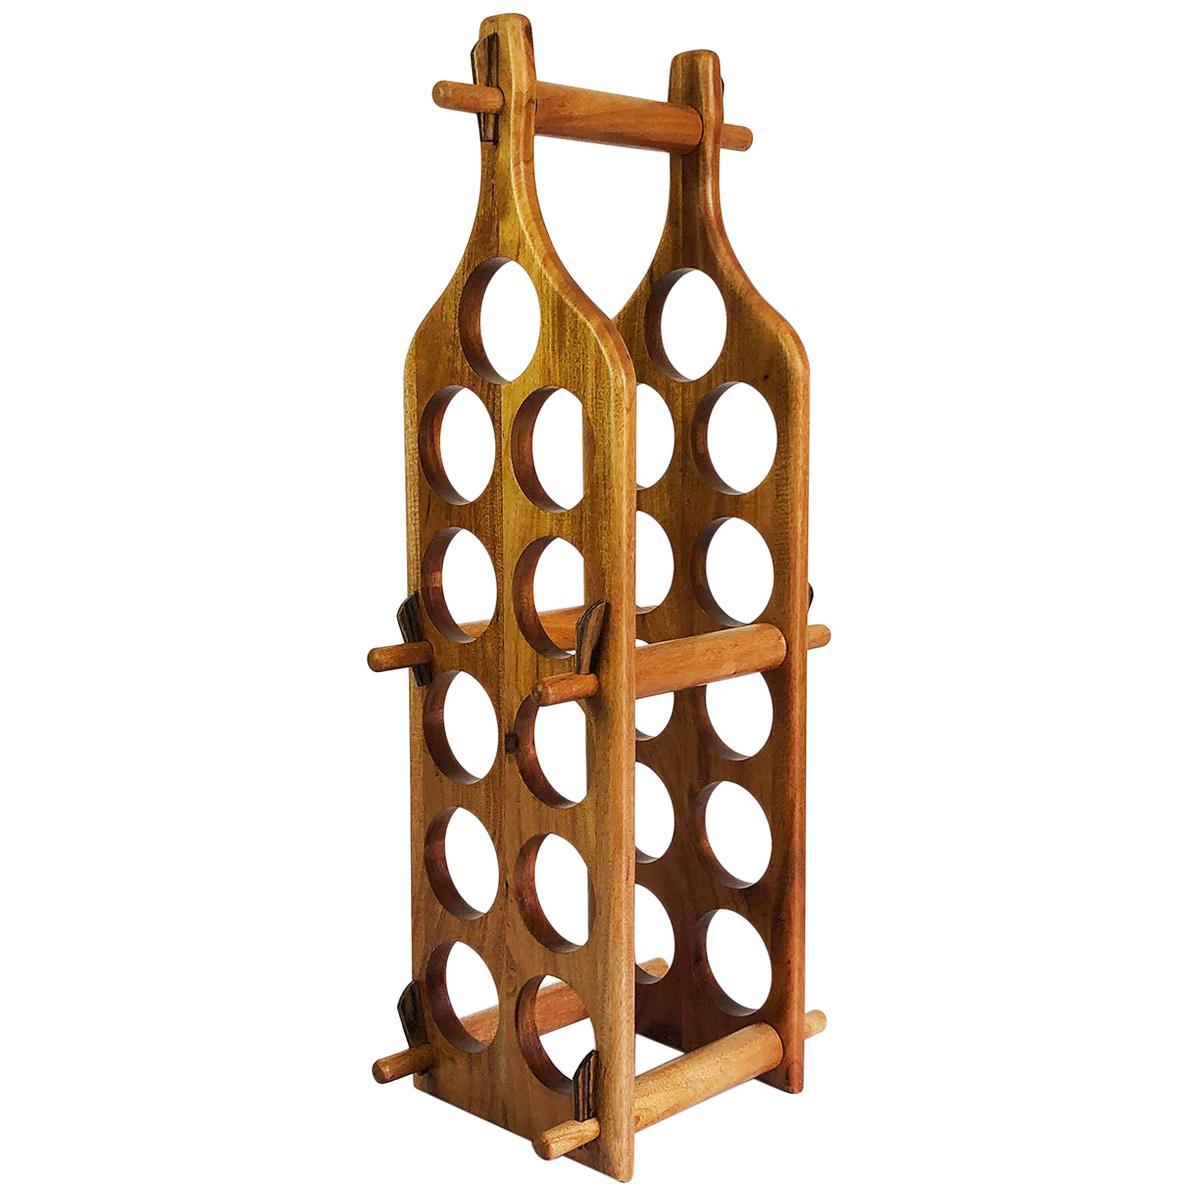 Wine Rack Made in Tropical Wood